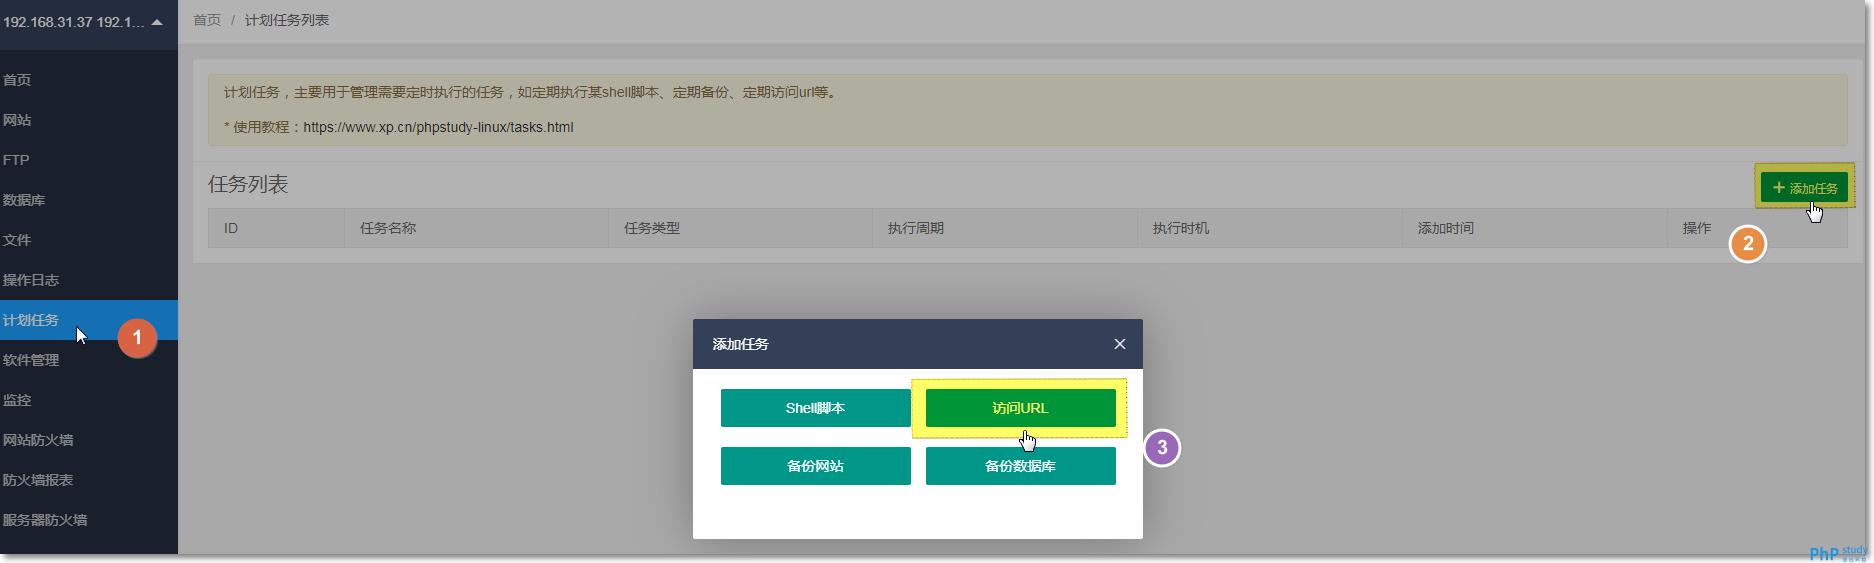 访问URL_01